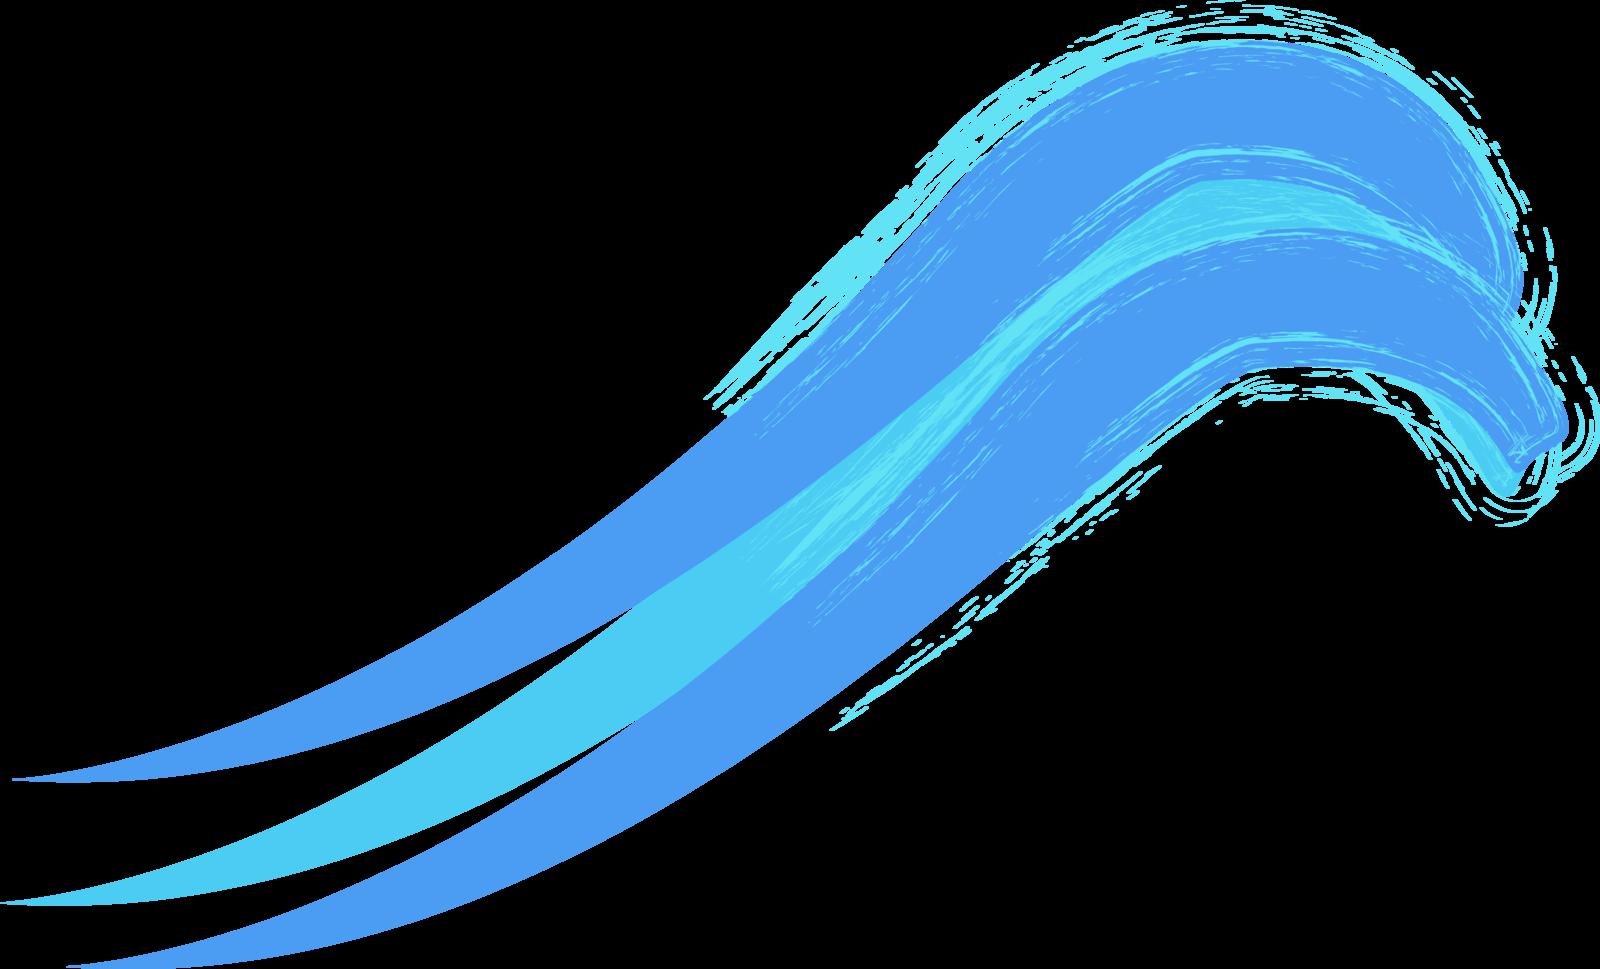 Waves ocean water clipart - Clipartix  Vector Sea Waves Png